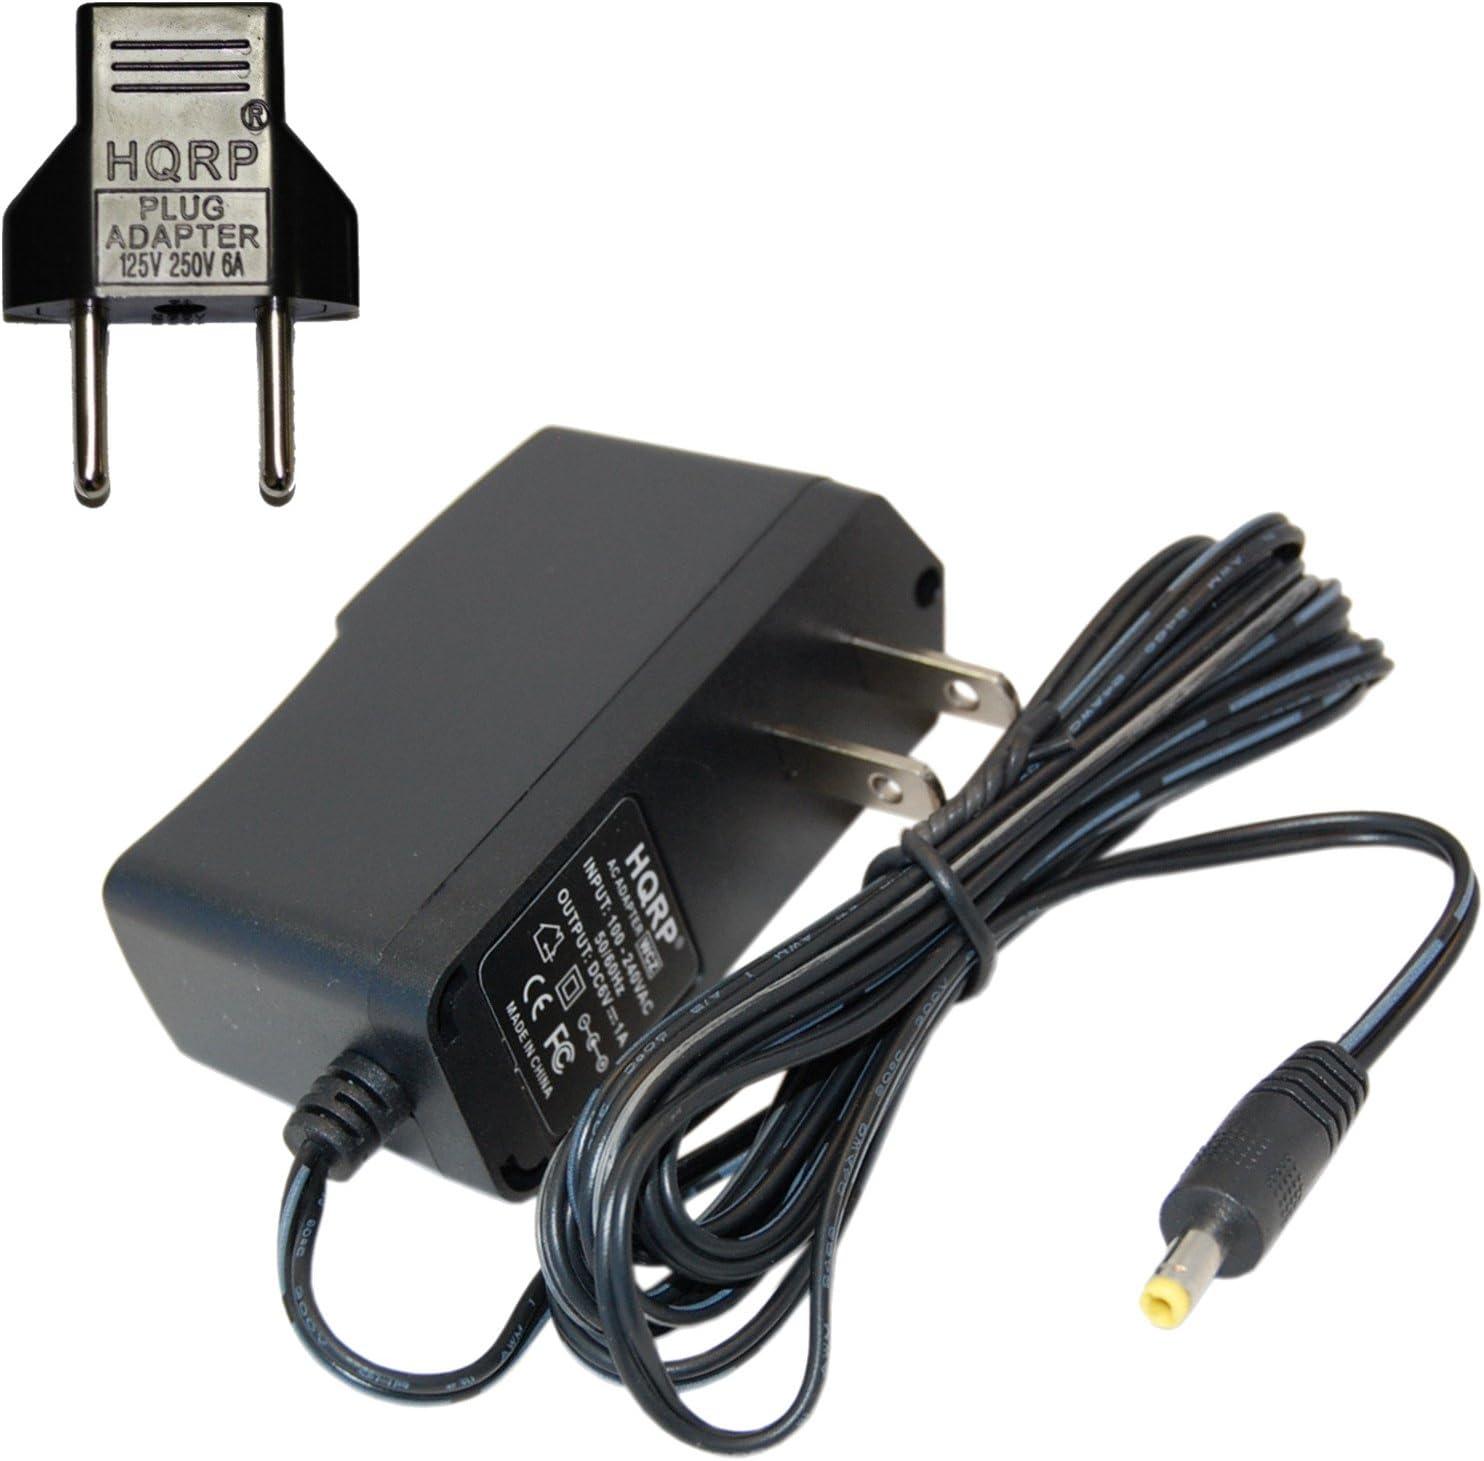 HQRP Adaptador de CA para Omron M2, M3, M3W/HEM-7202-E (V), M6Comfort/HEM-7223-E, M6W/HEM-7213-E, M10-IT/HEM-7080IT-E Control de la tensión Arterial